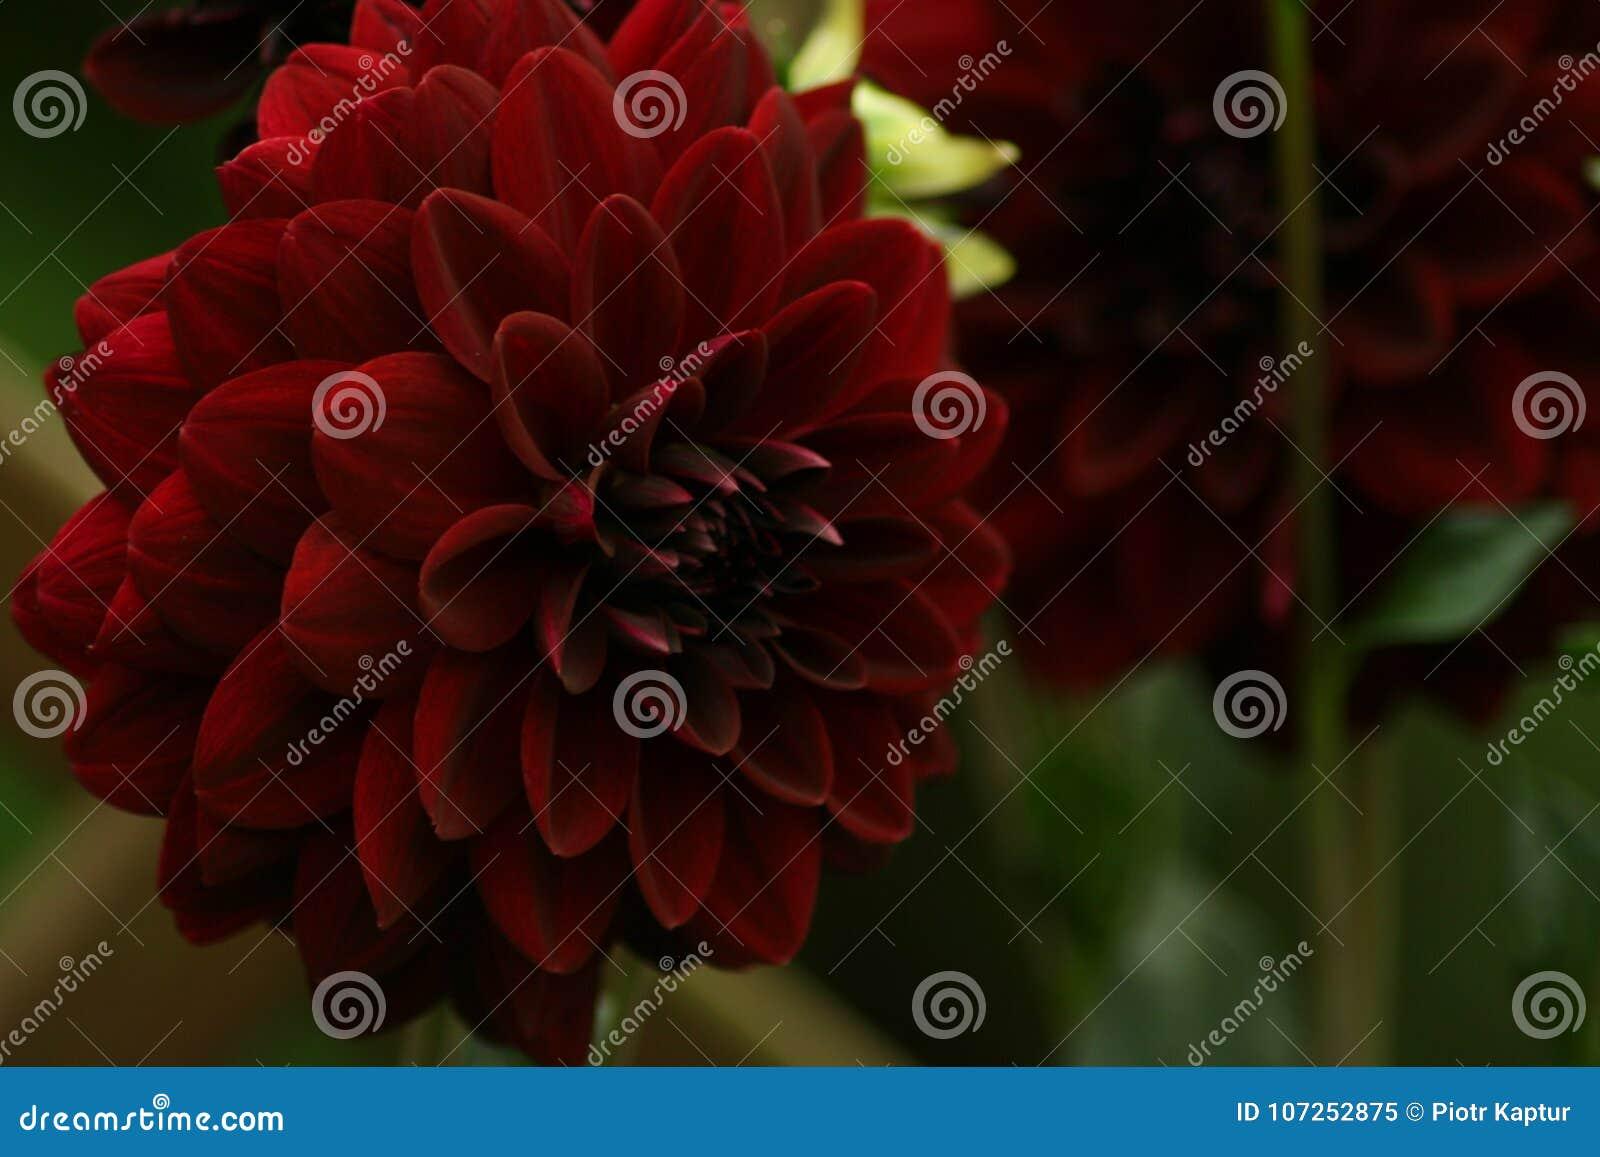 Flowers In Gardens Dahlia Arabian Night Stock Image